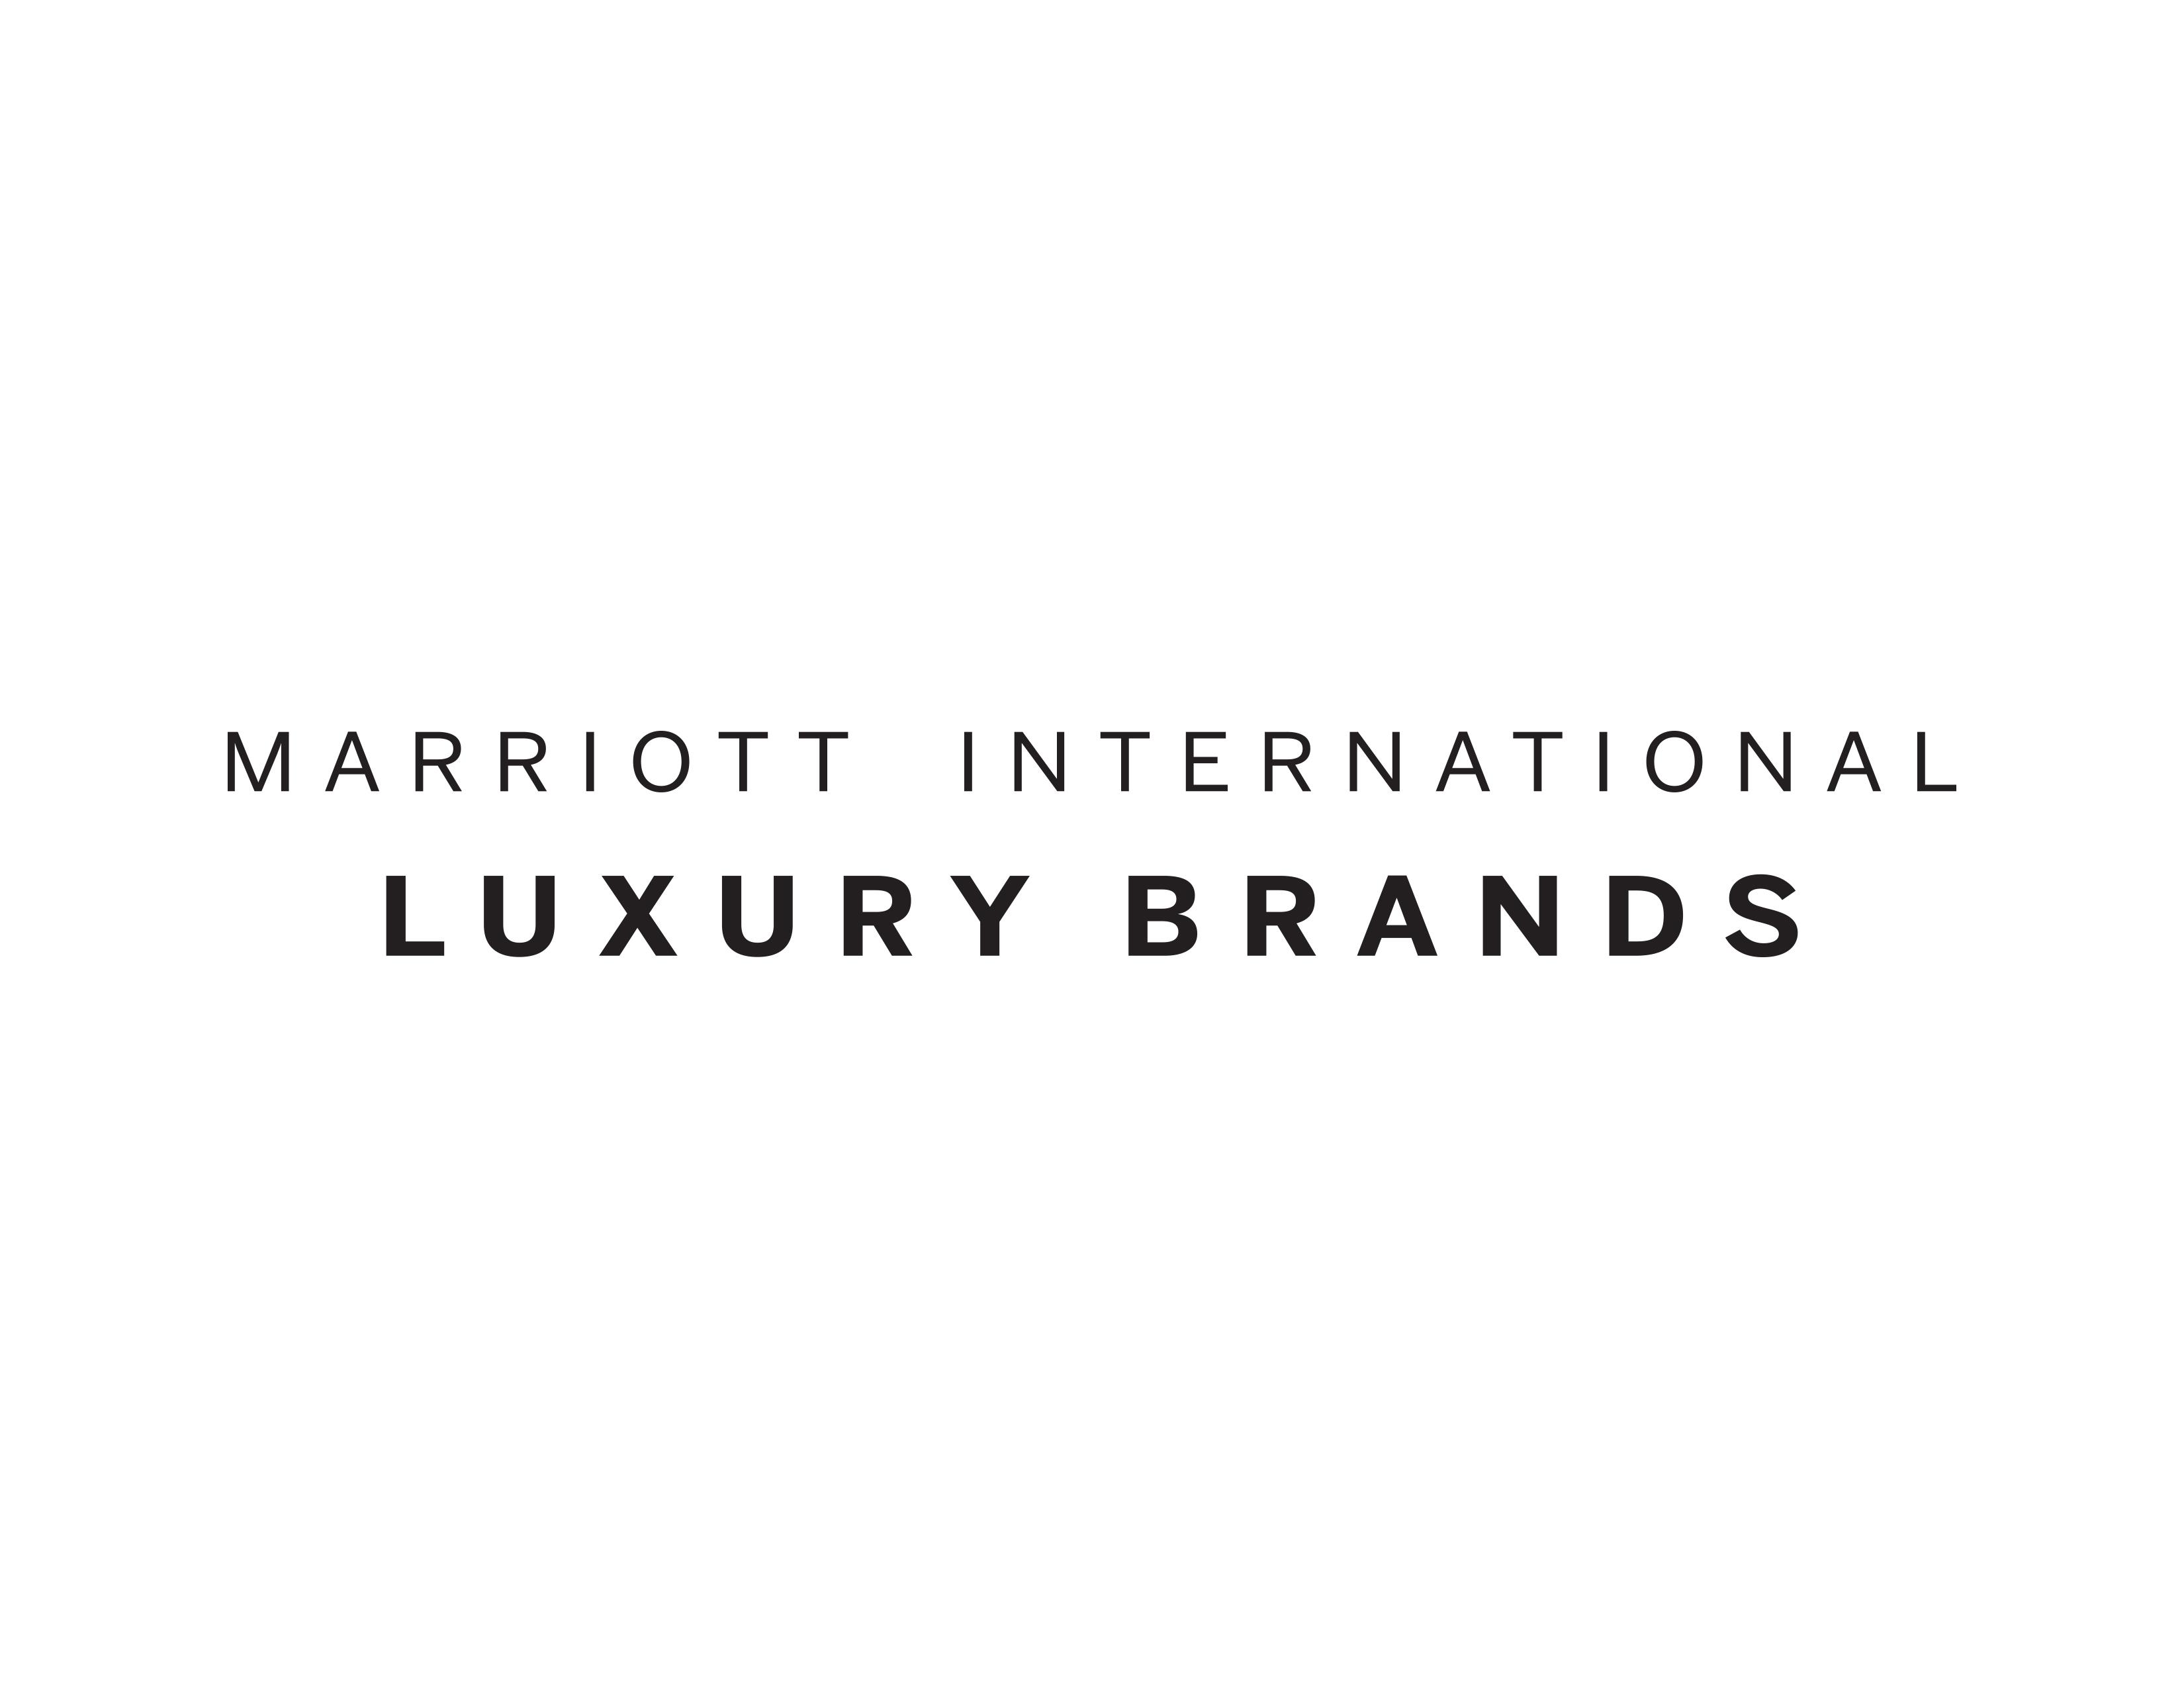 Marriott International Luxury Brand